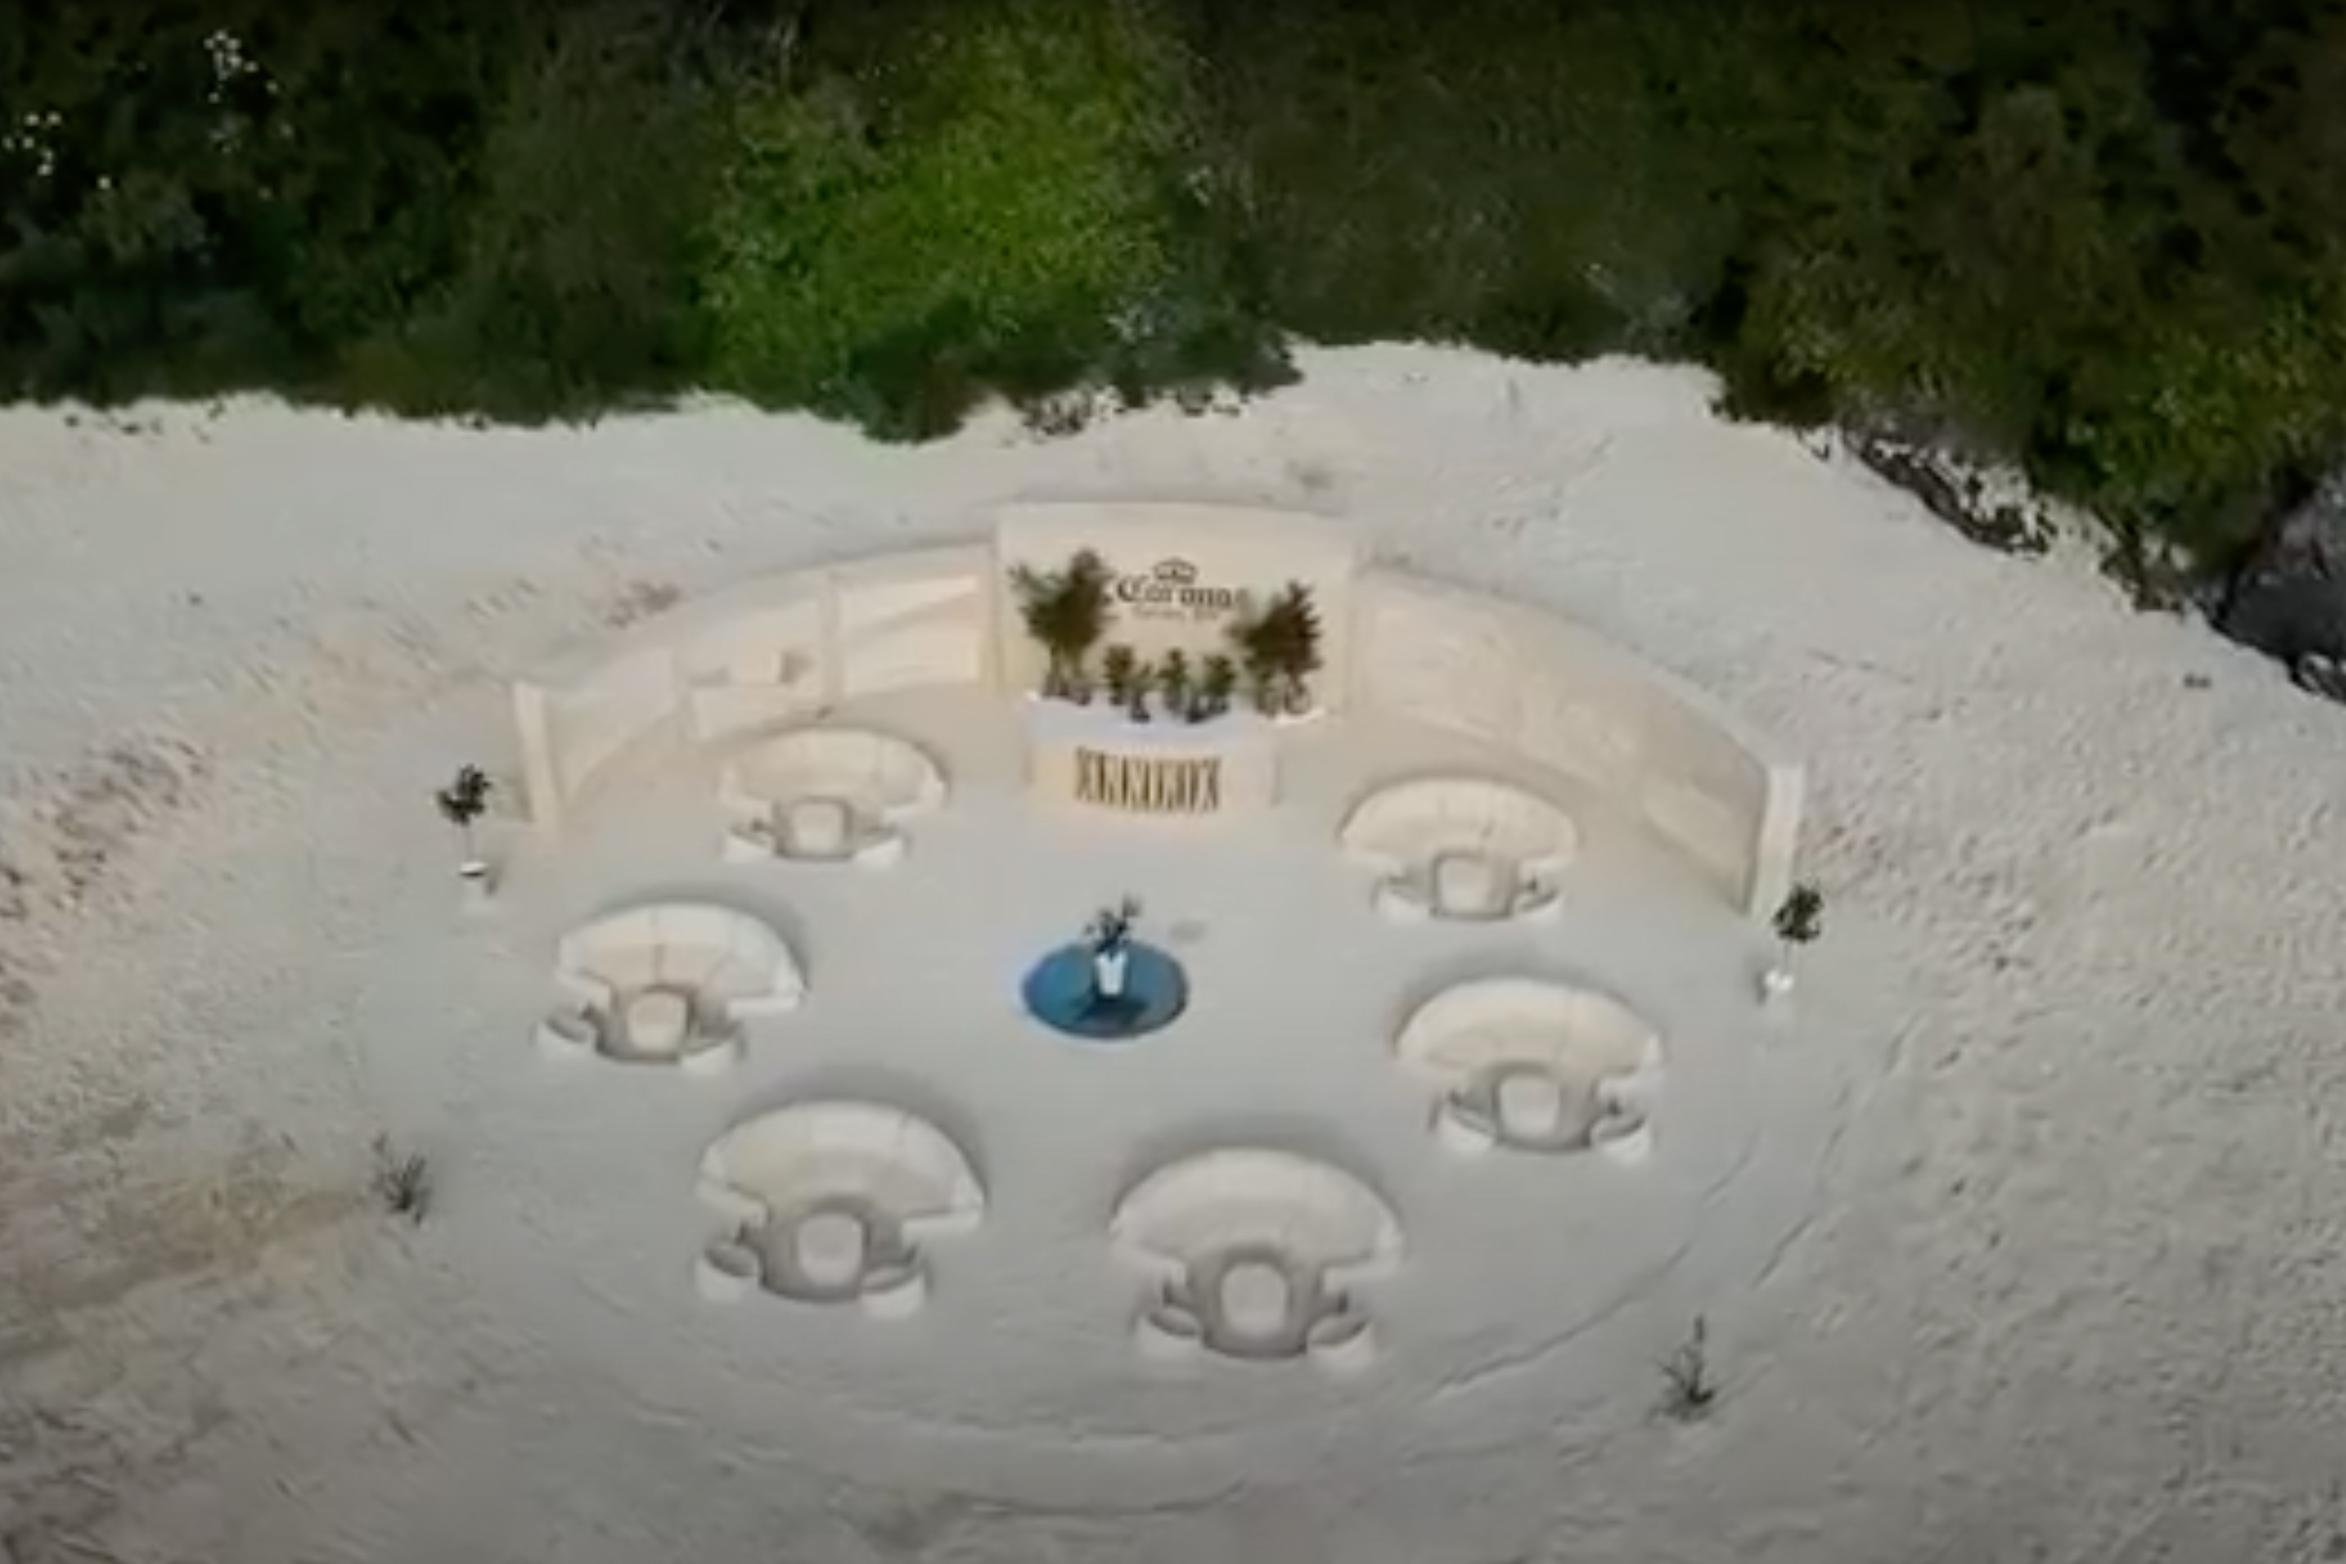 Corona's all-natural beach bar marks brand's eco-milestone